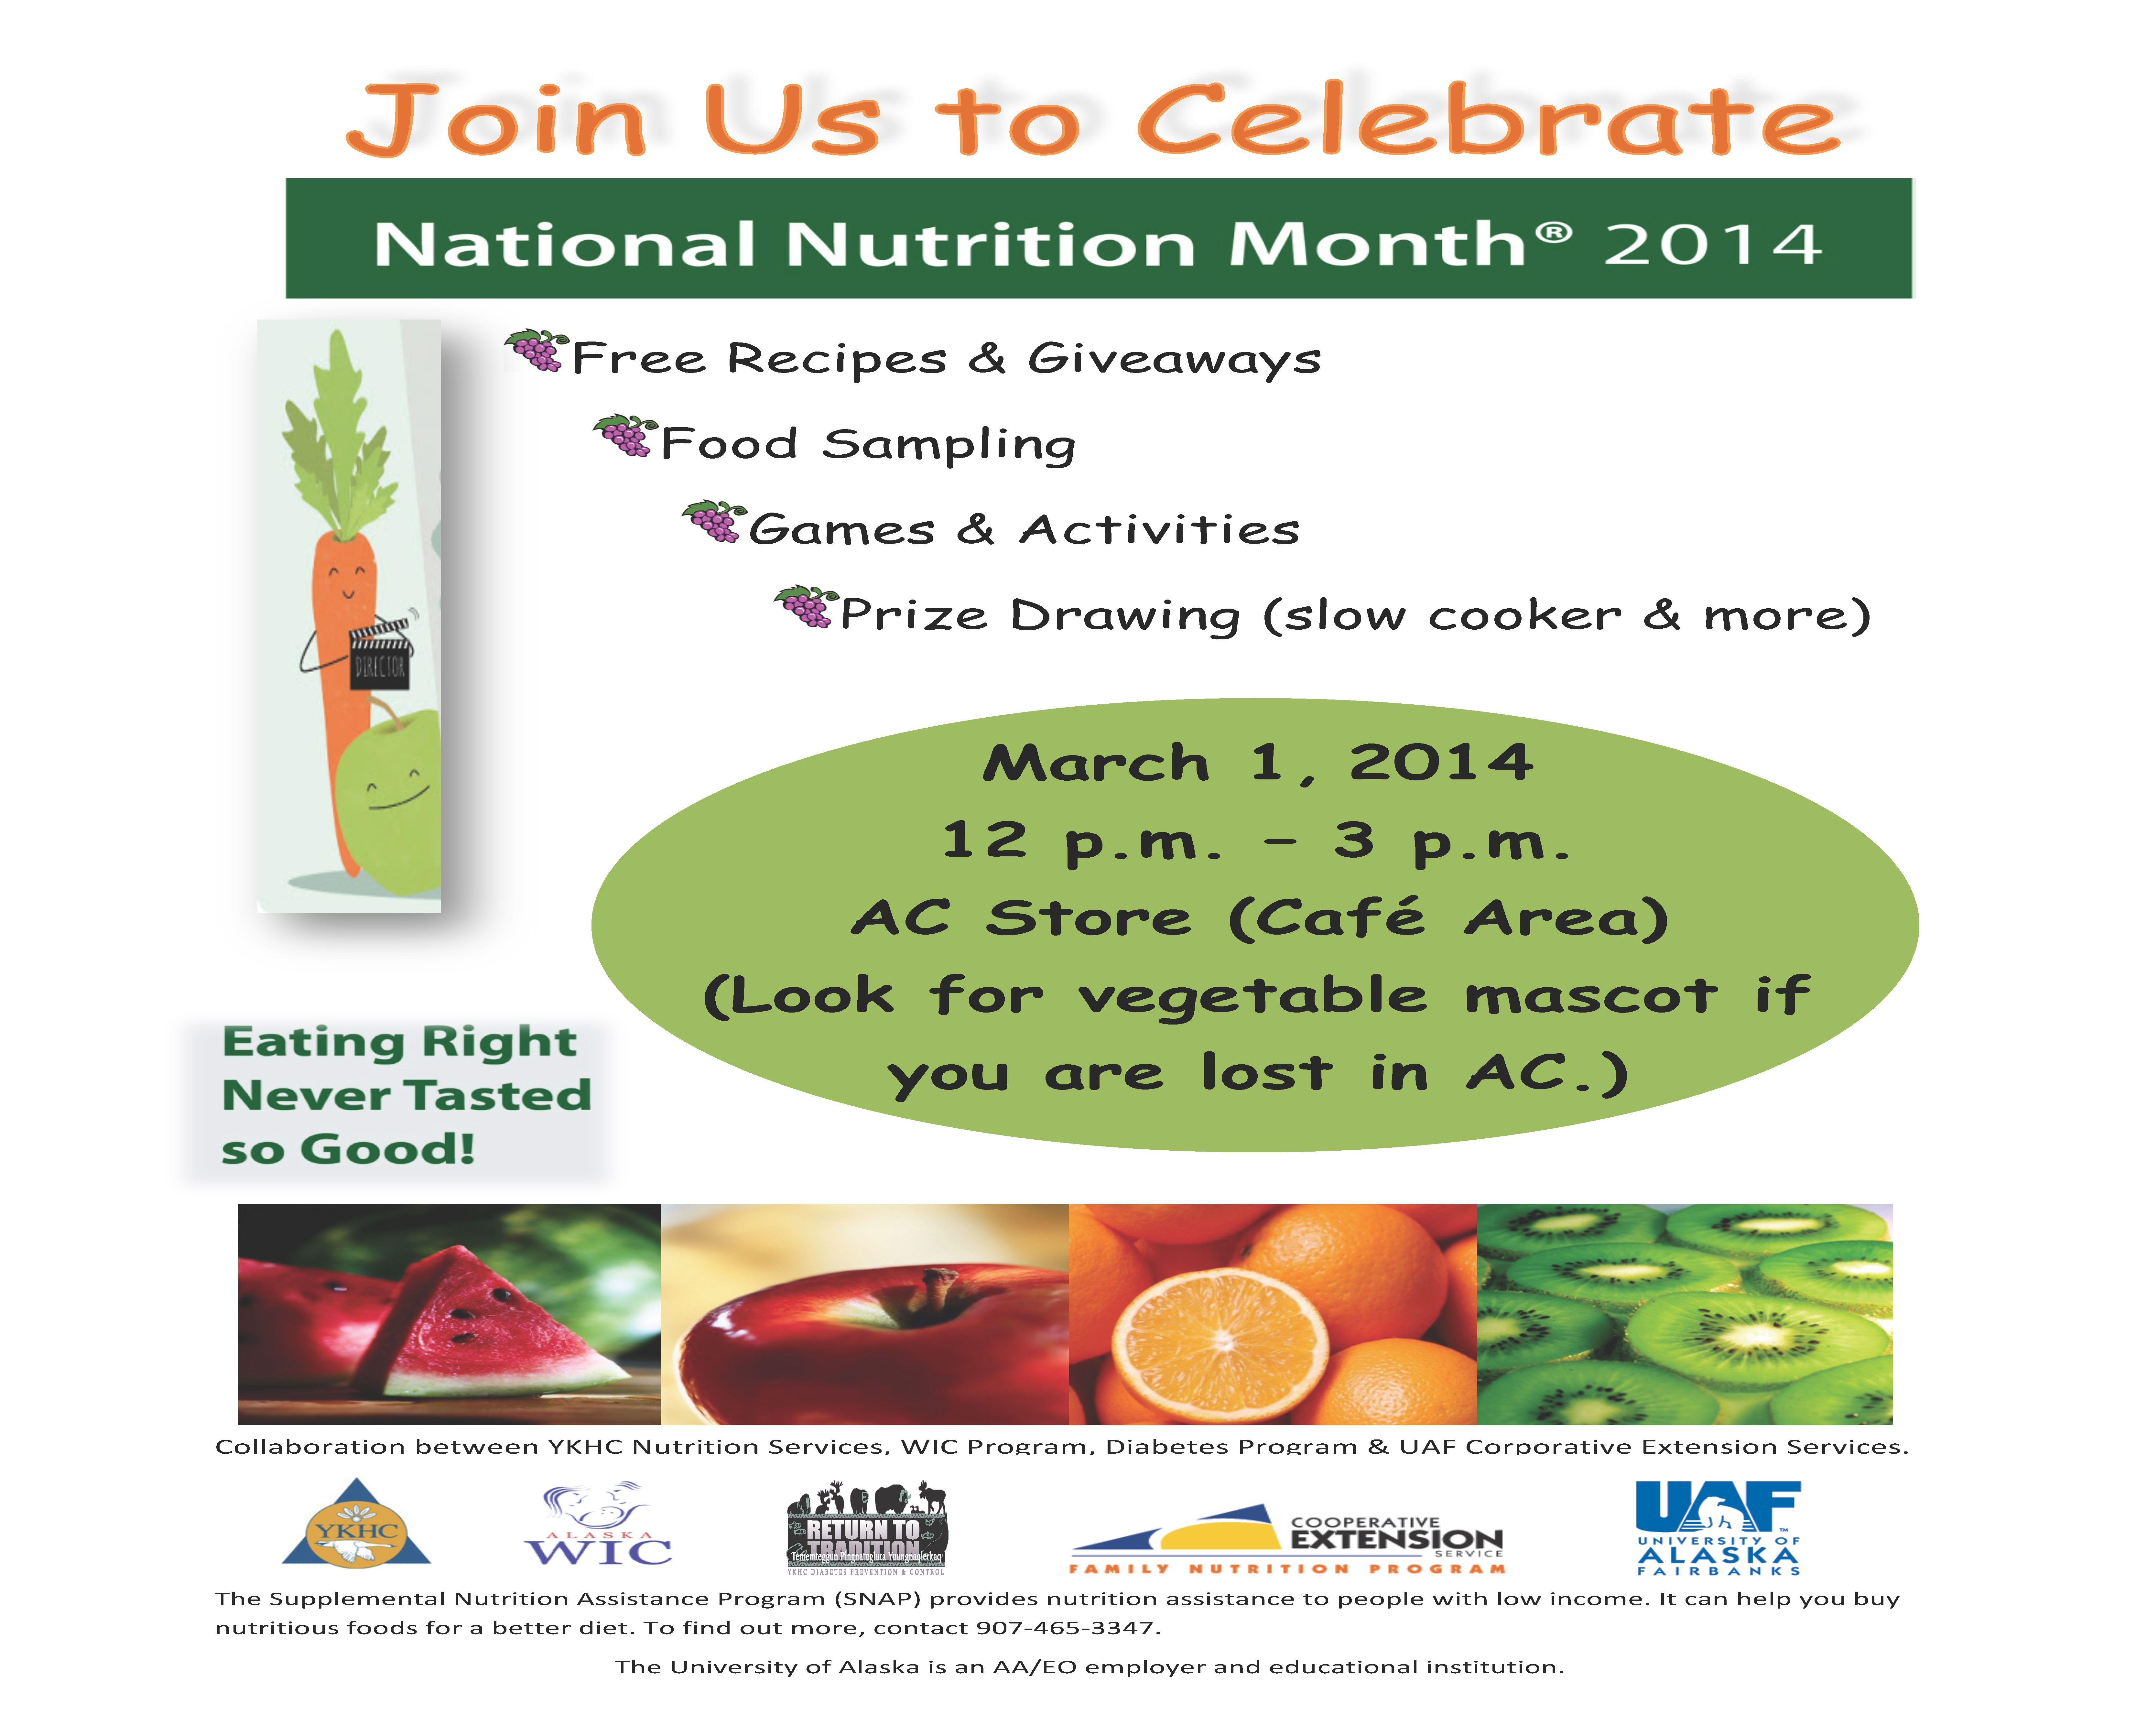 March 1 National Nutrition Month Celebration In Tok National Nutrition Month Nutrition Month Food Sampling